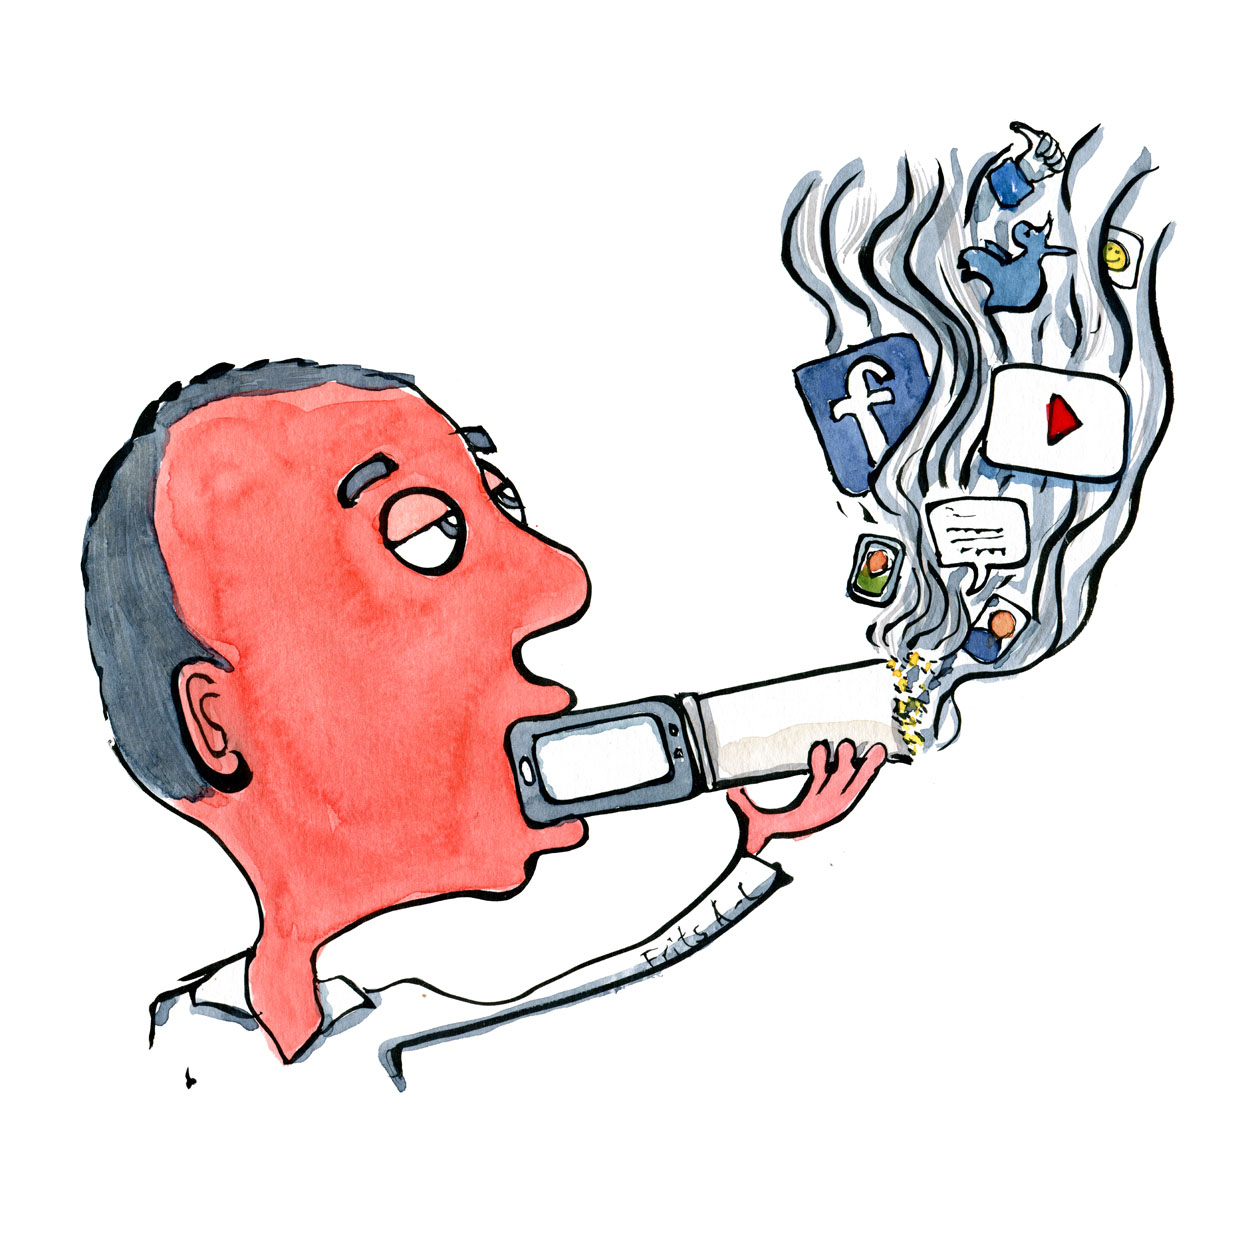 Drawing of a man smoking social media junkie. Illustration by Frits Ahlefeldt